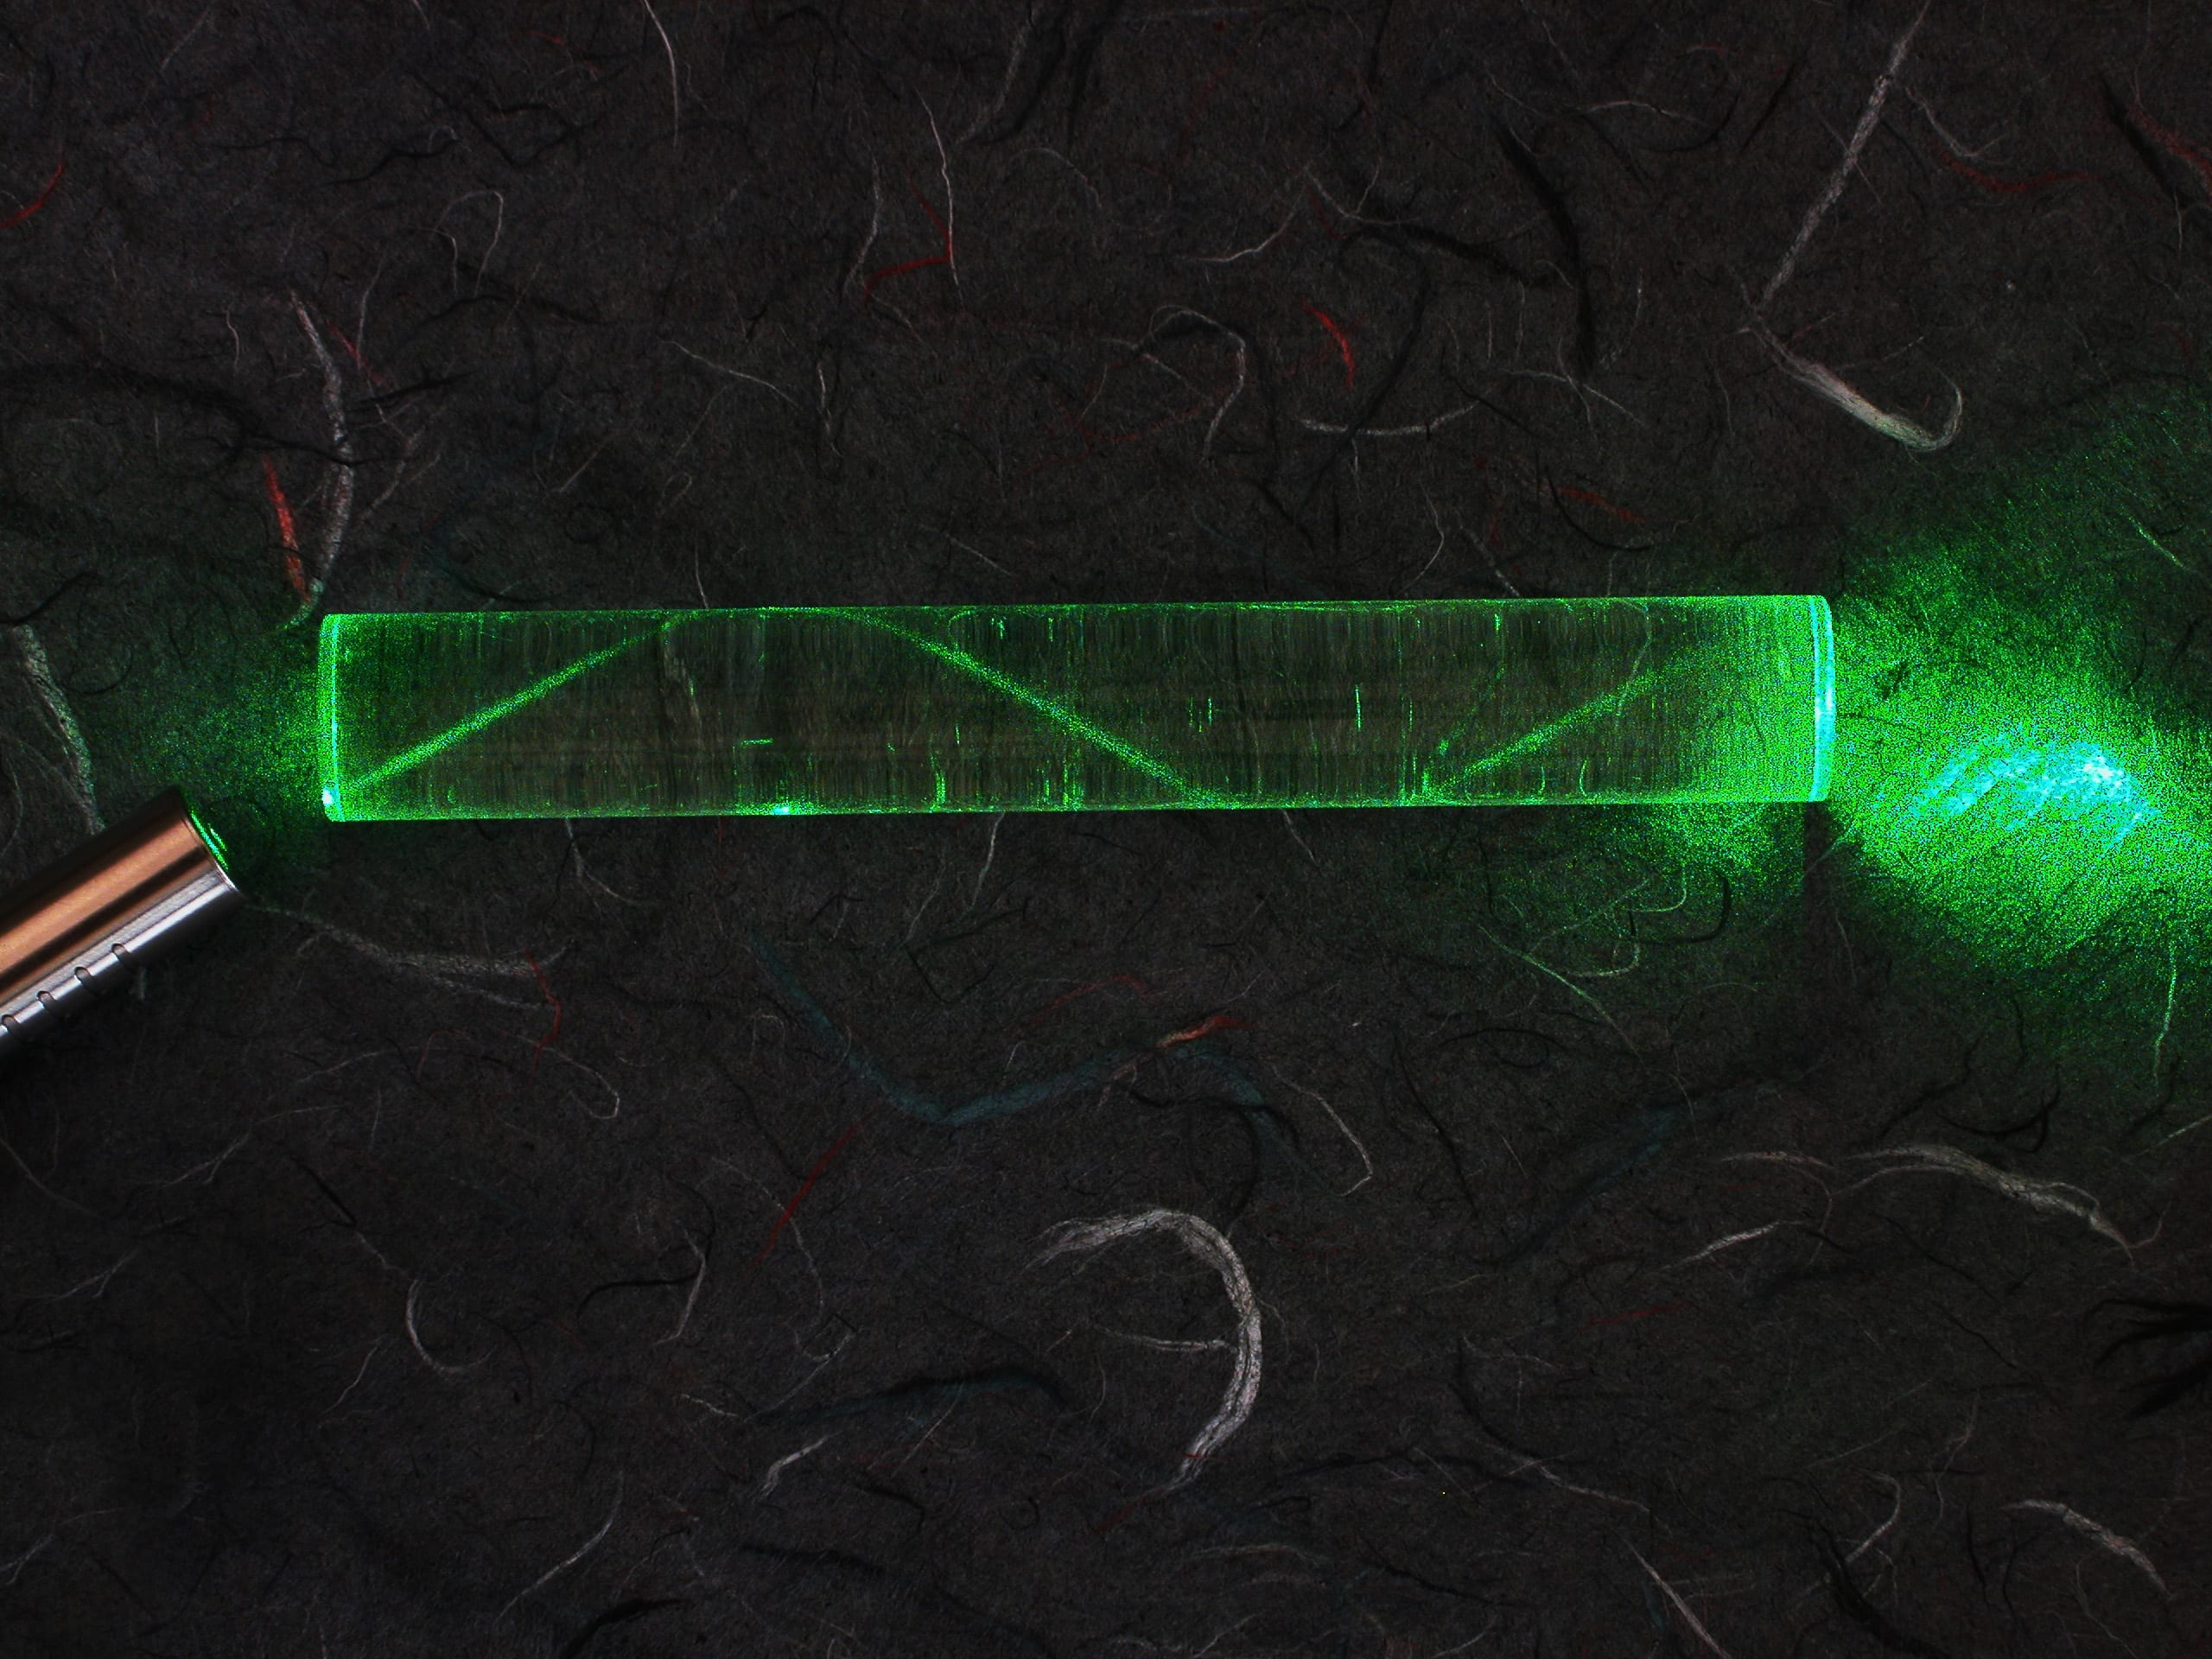 facts about fiber optics